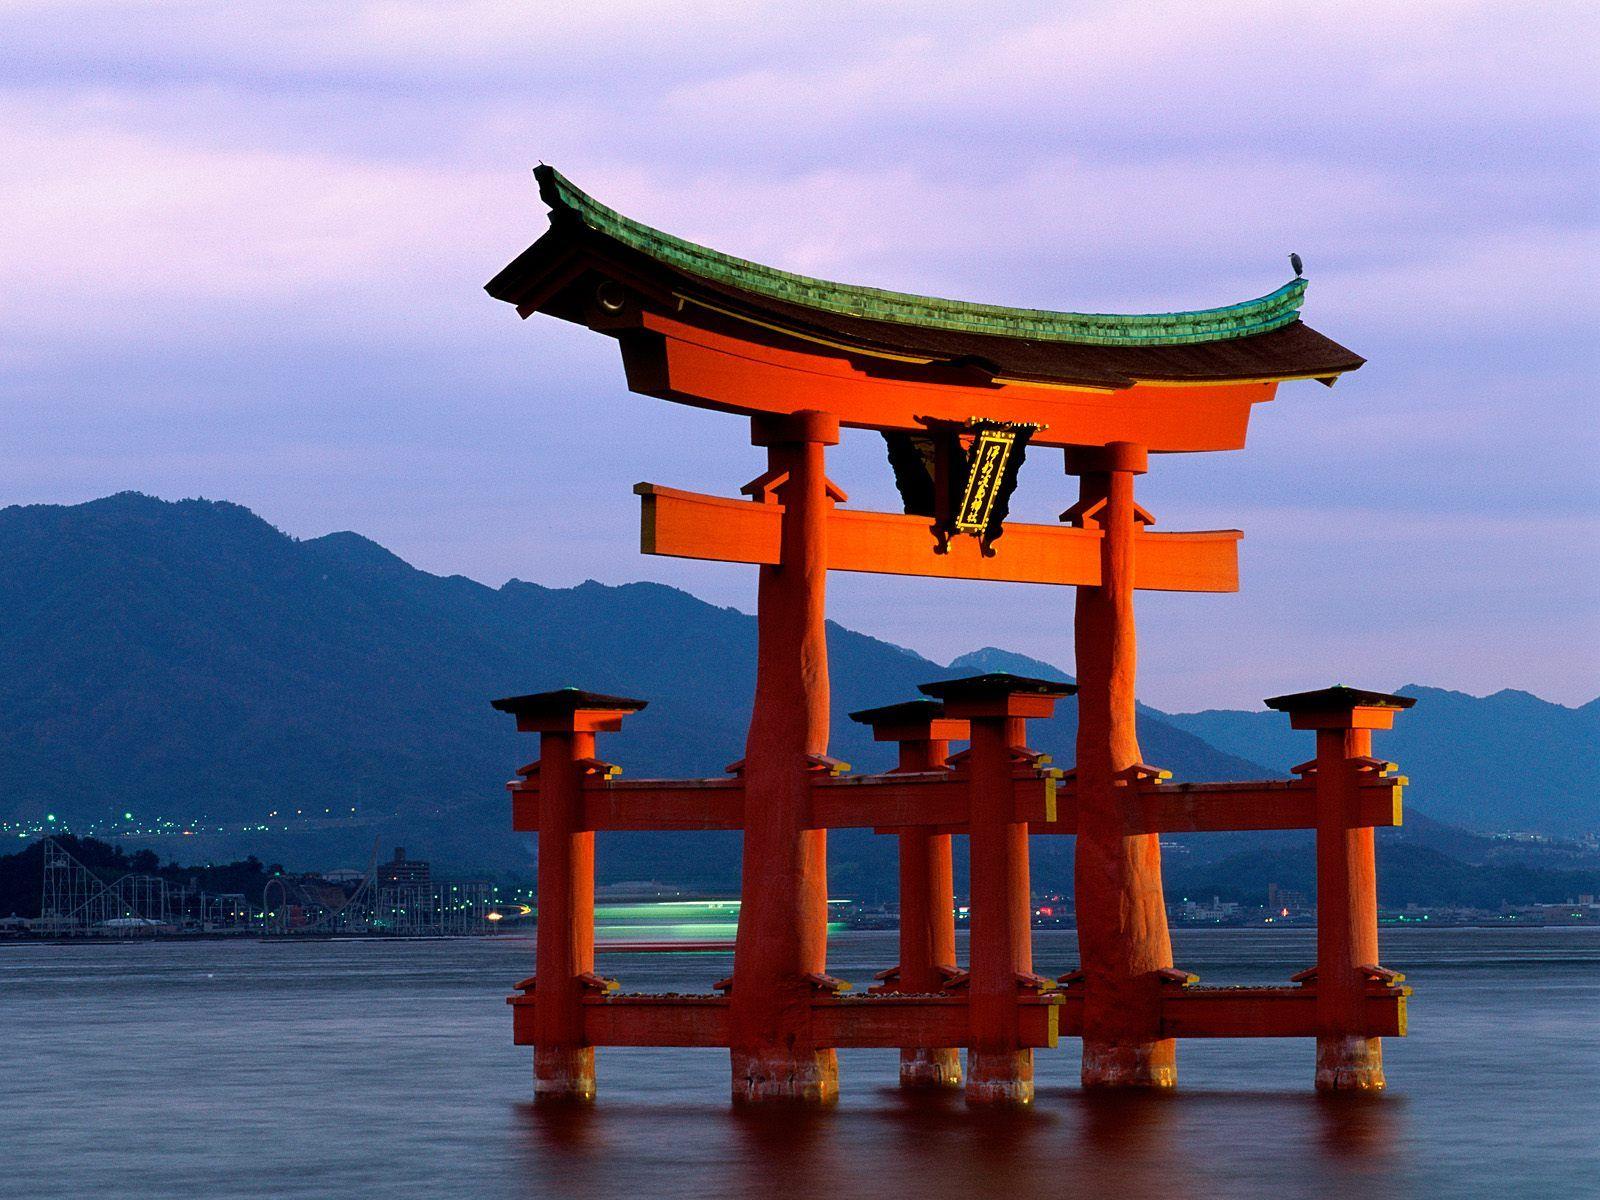 miyajima temple japan Miyajima Japan Japan Japan tourism 1600x1200